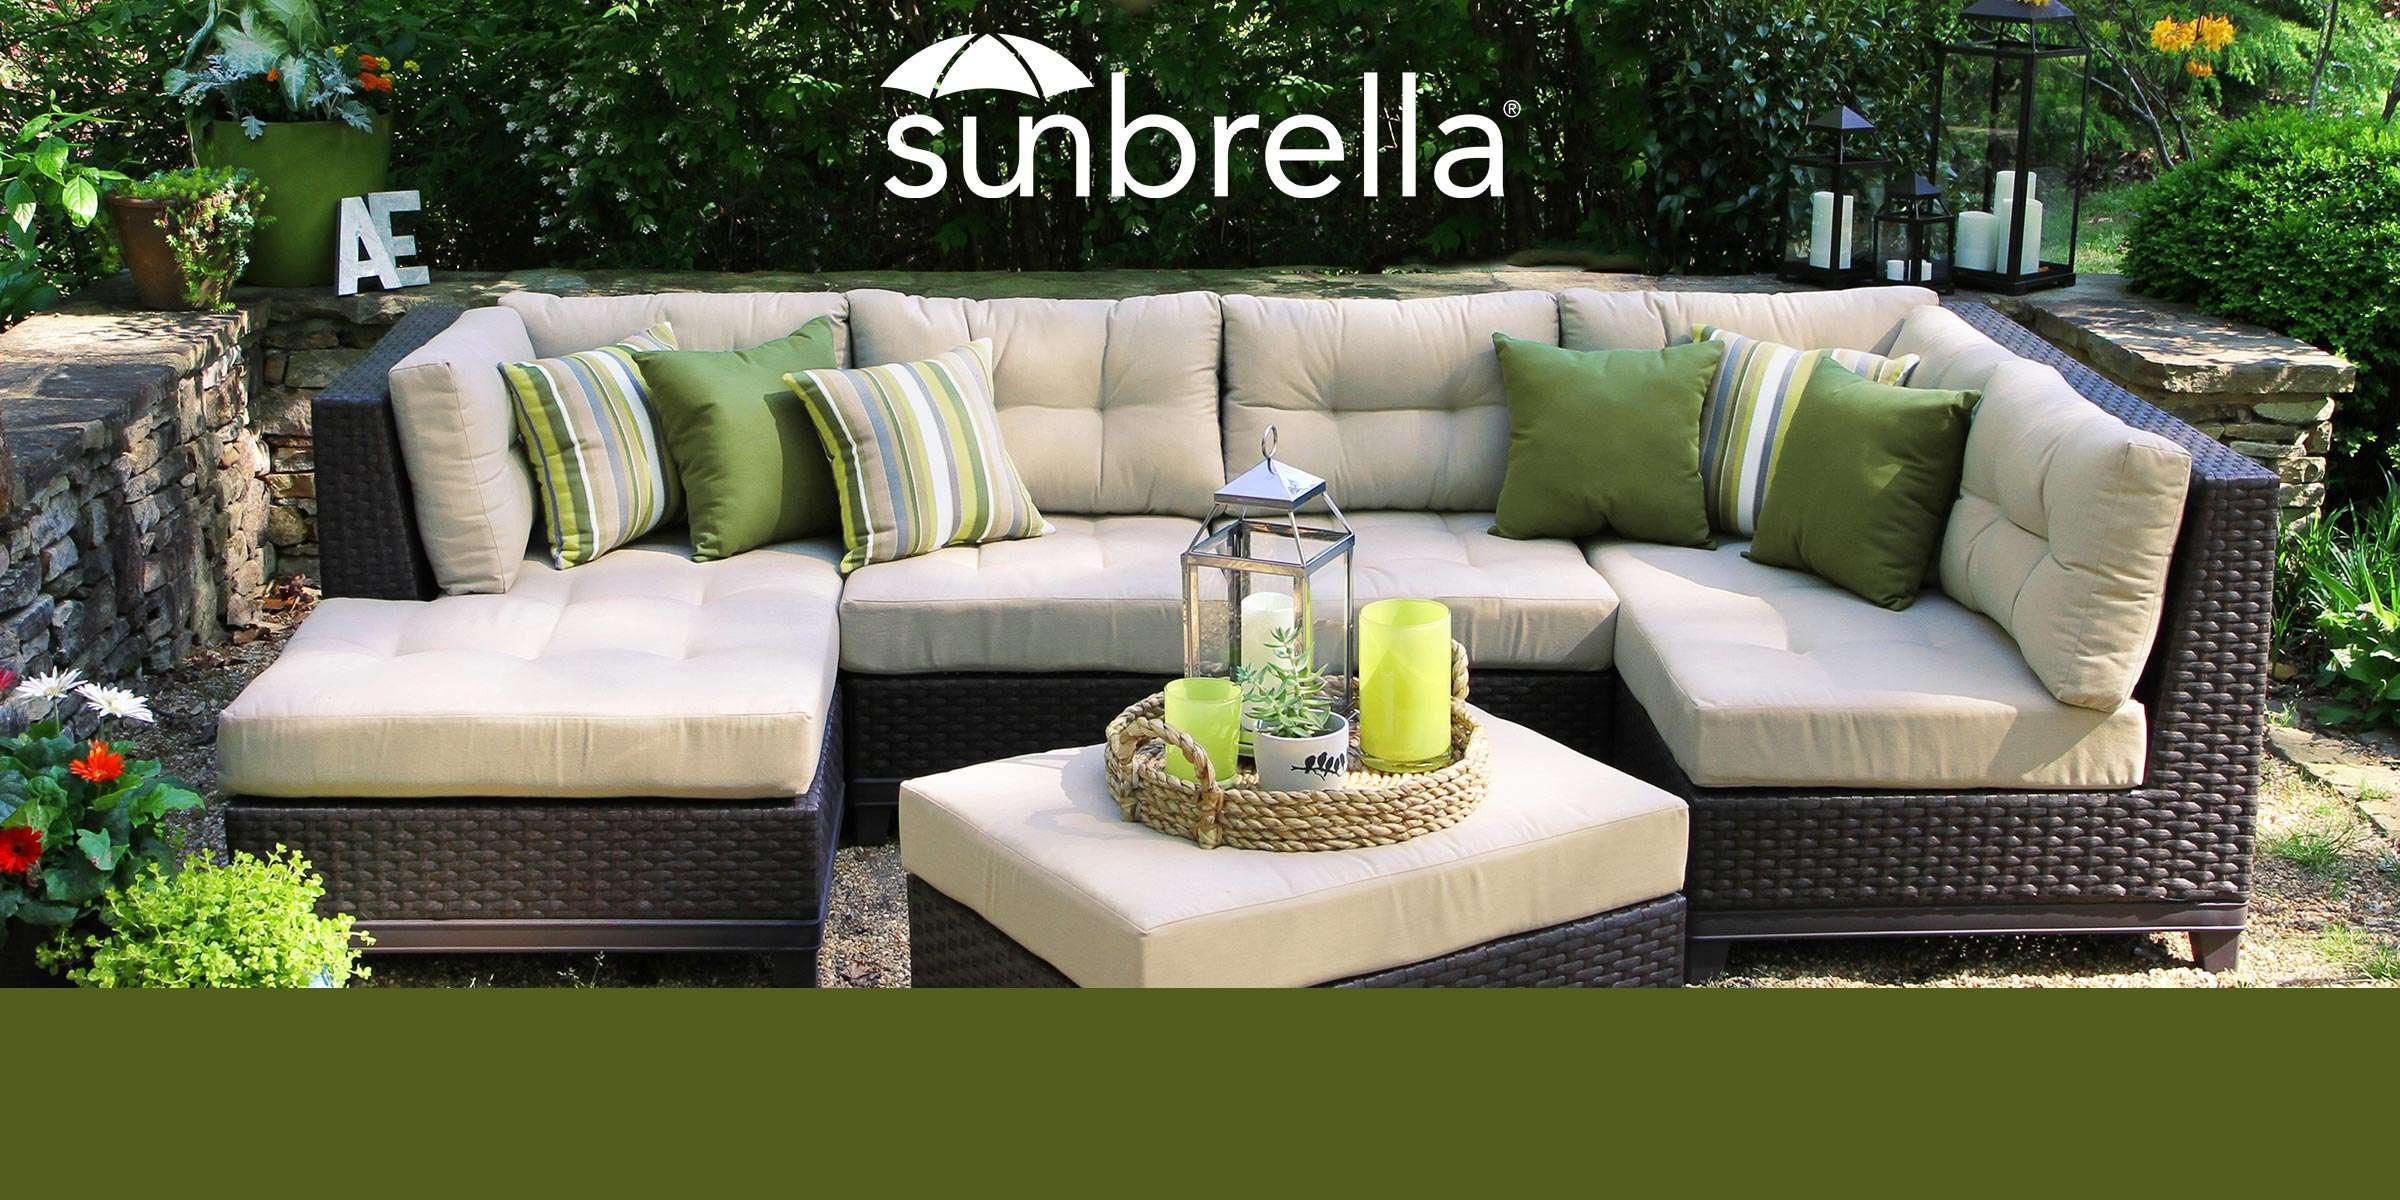 Best ideas about Sunbrella Outdoor Furniture . Save or Pin Sunbrella Tar Now.